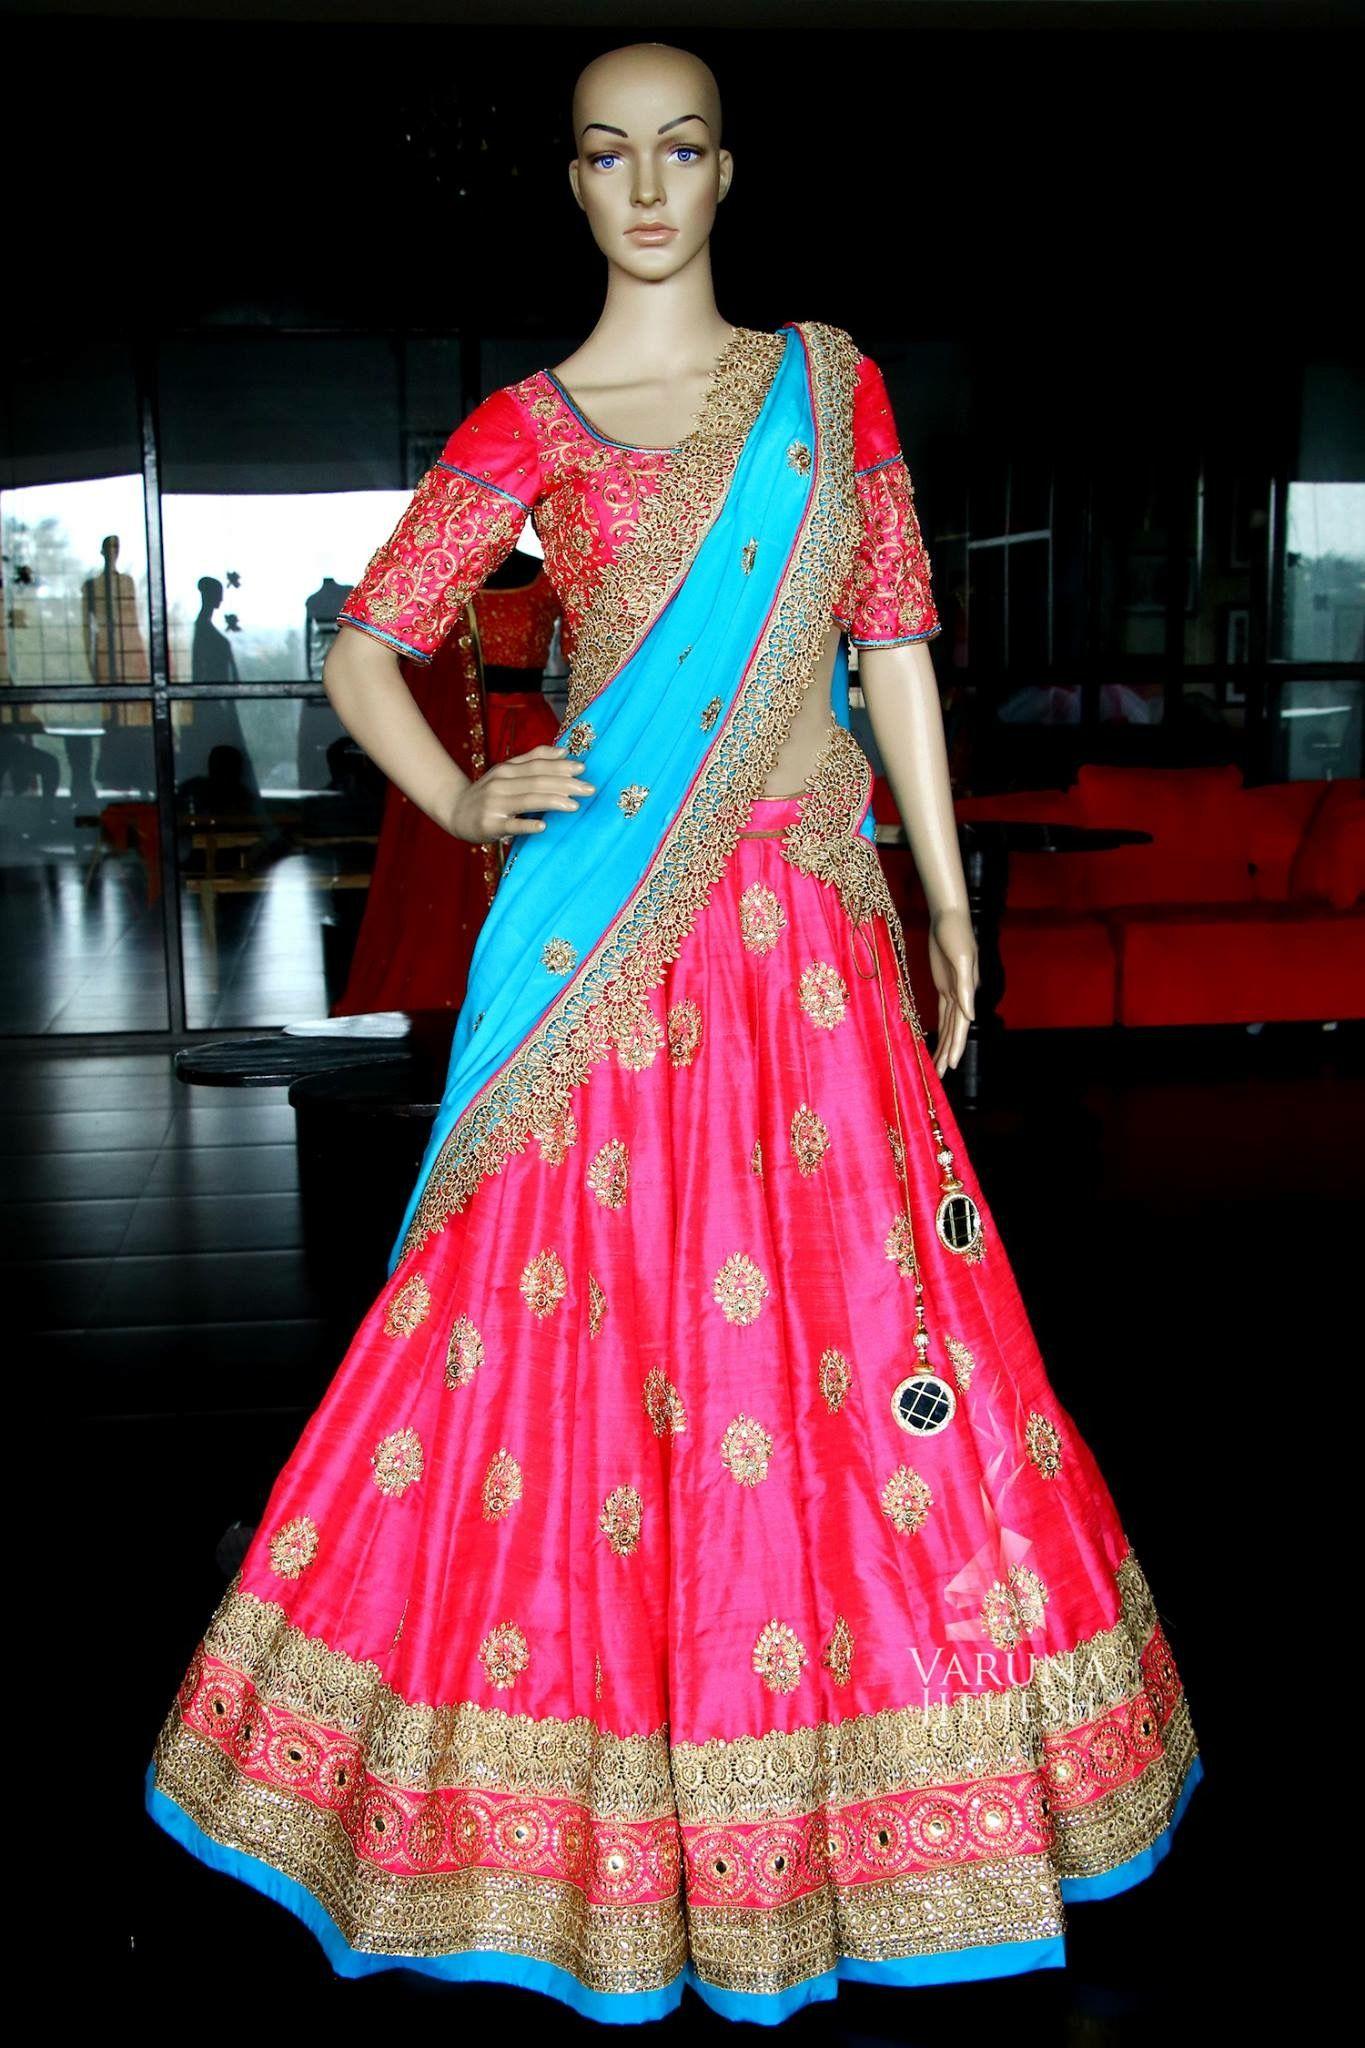 Pin von Spandana Reddy Sappidi auf Dresses,sarees,lehangas   Pinterest